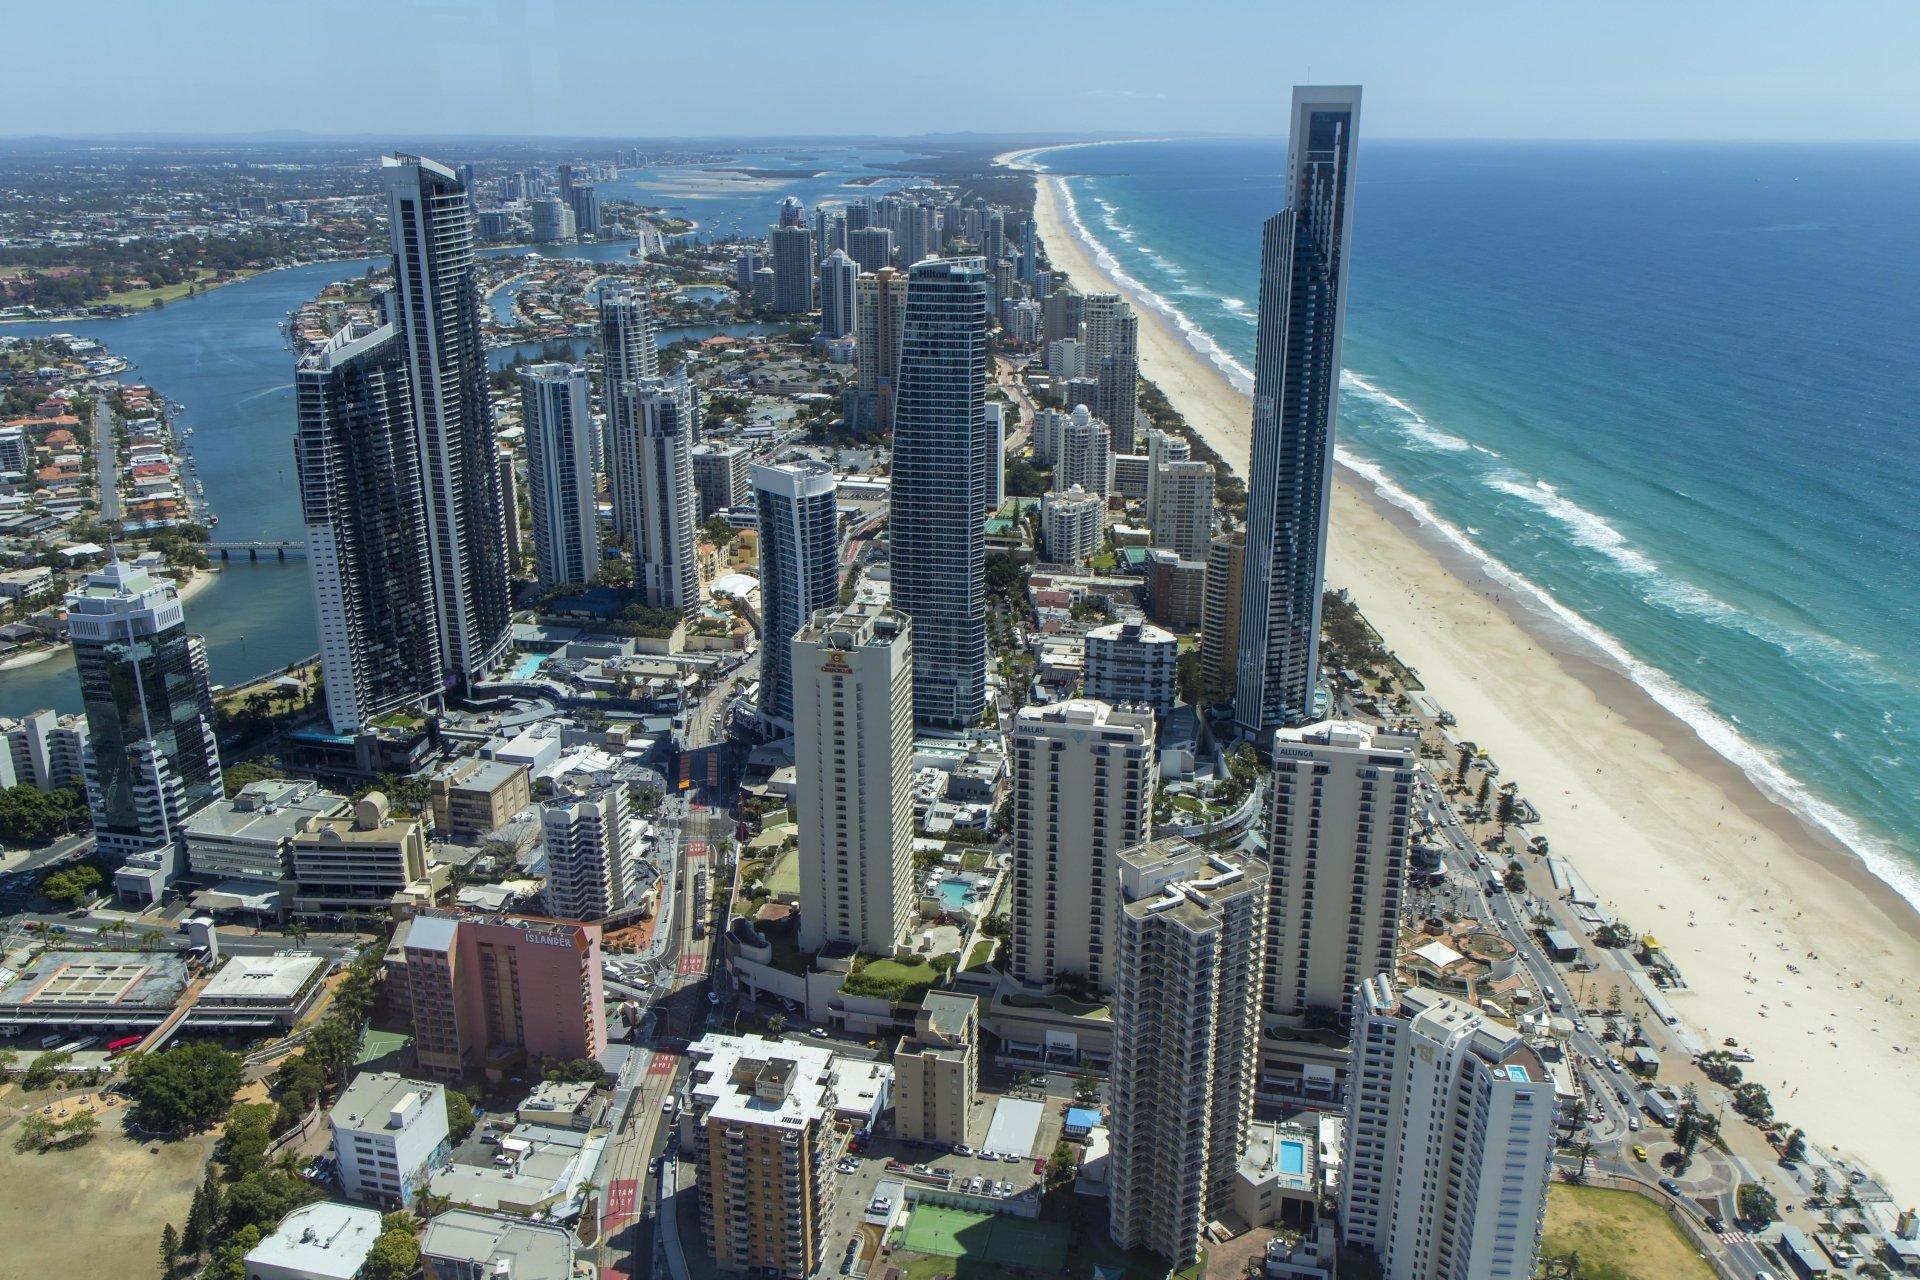 Gold Coast City From Q1 4k Ultra HD Wallpaper